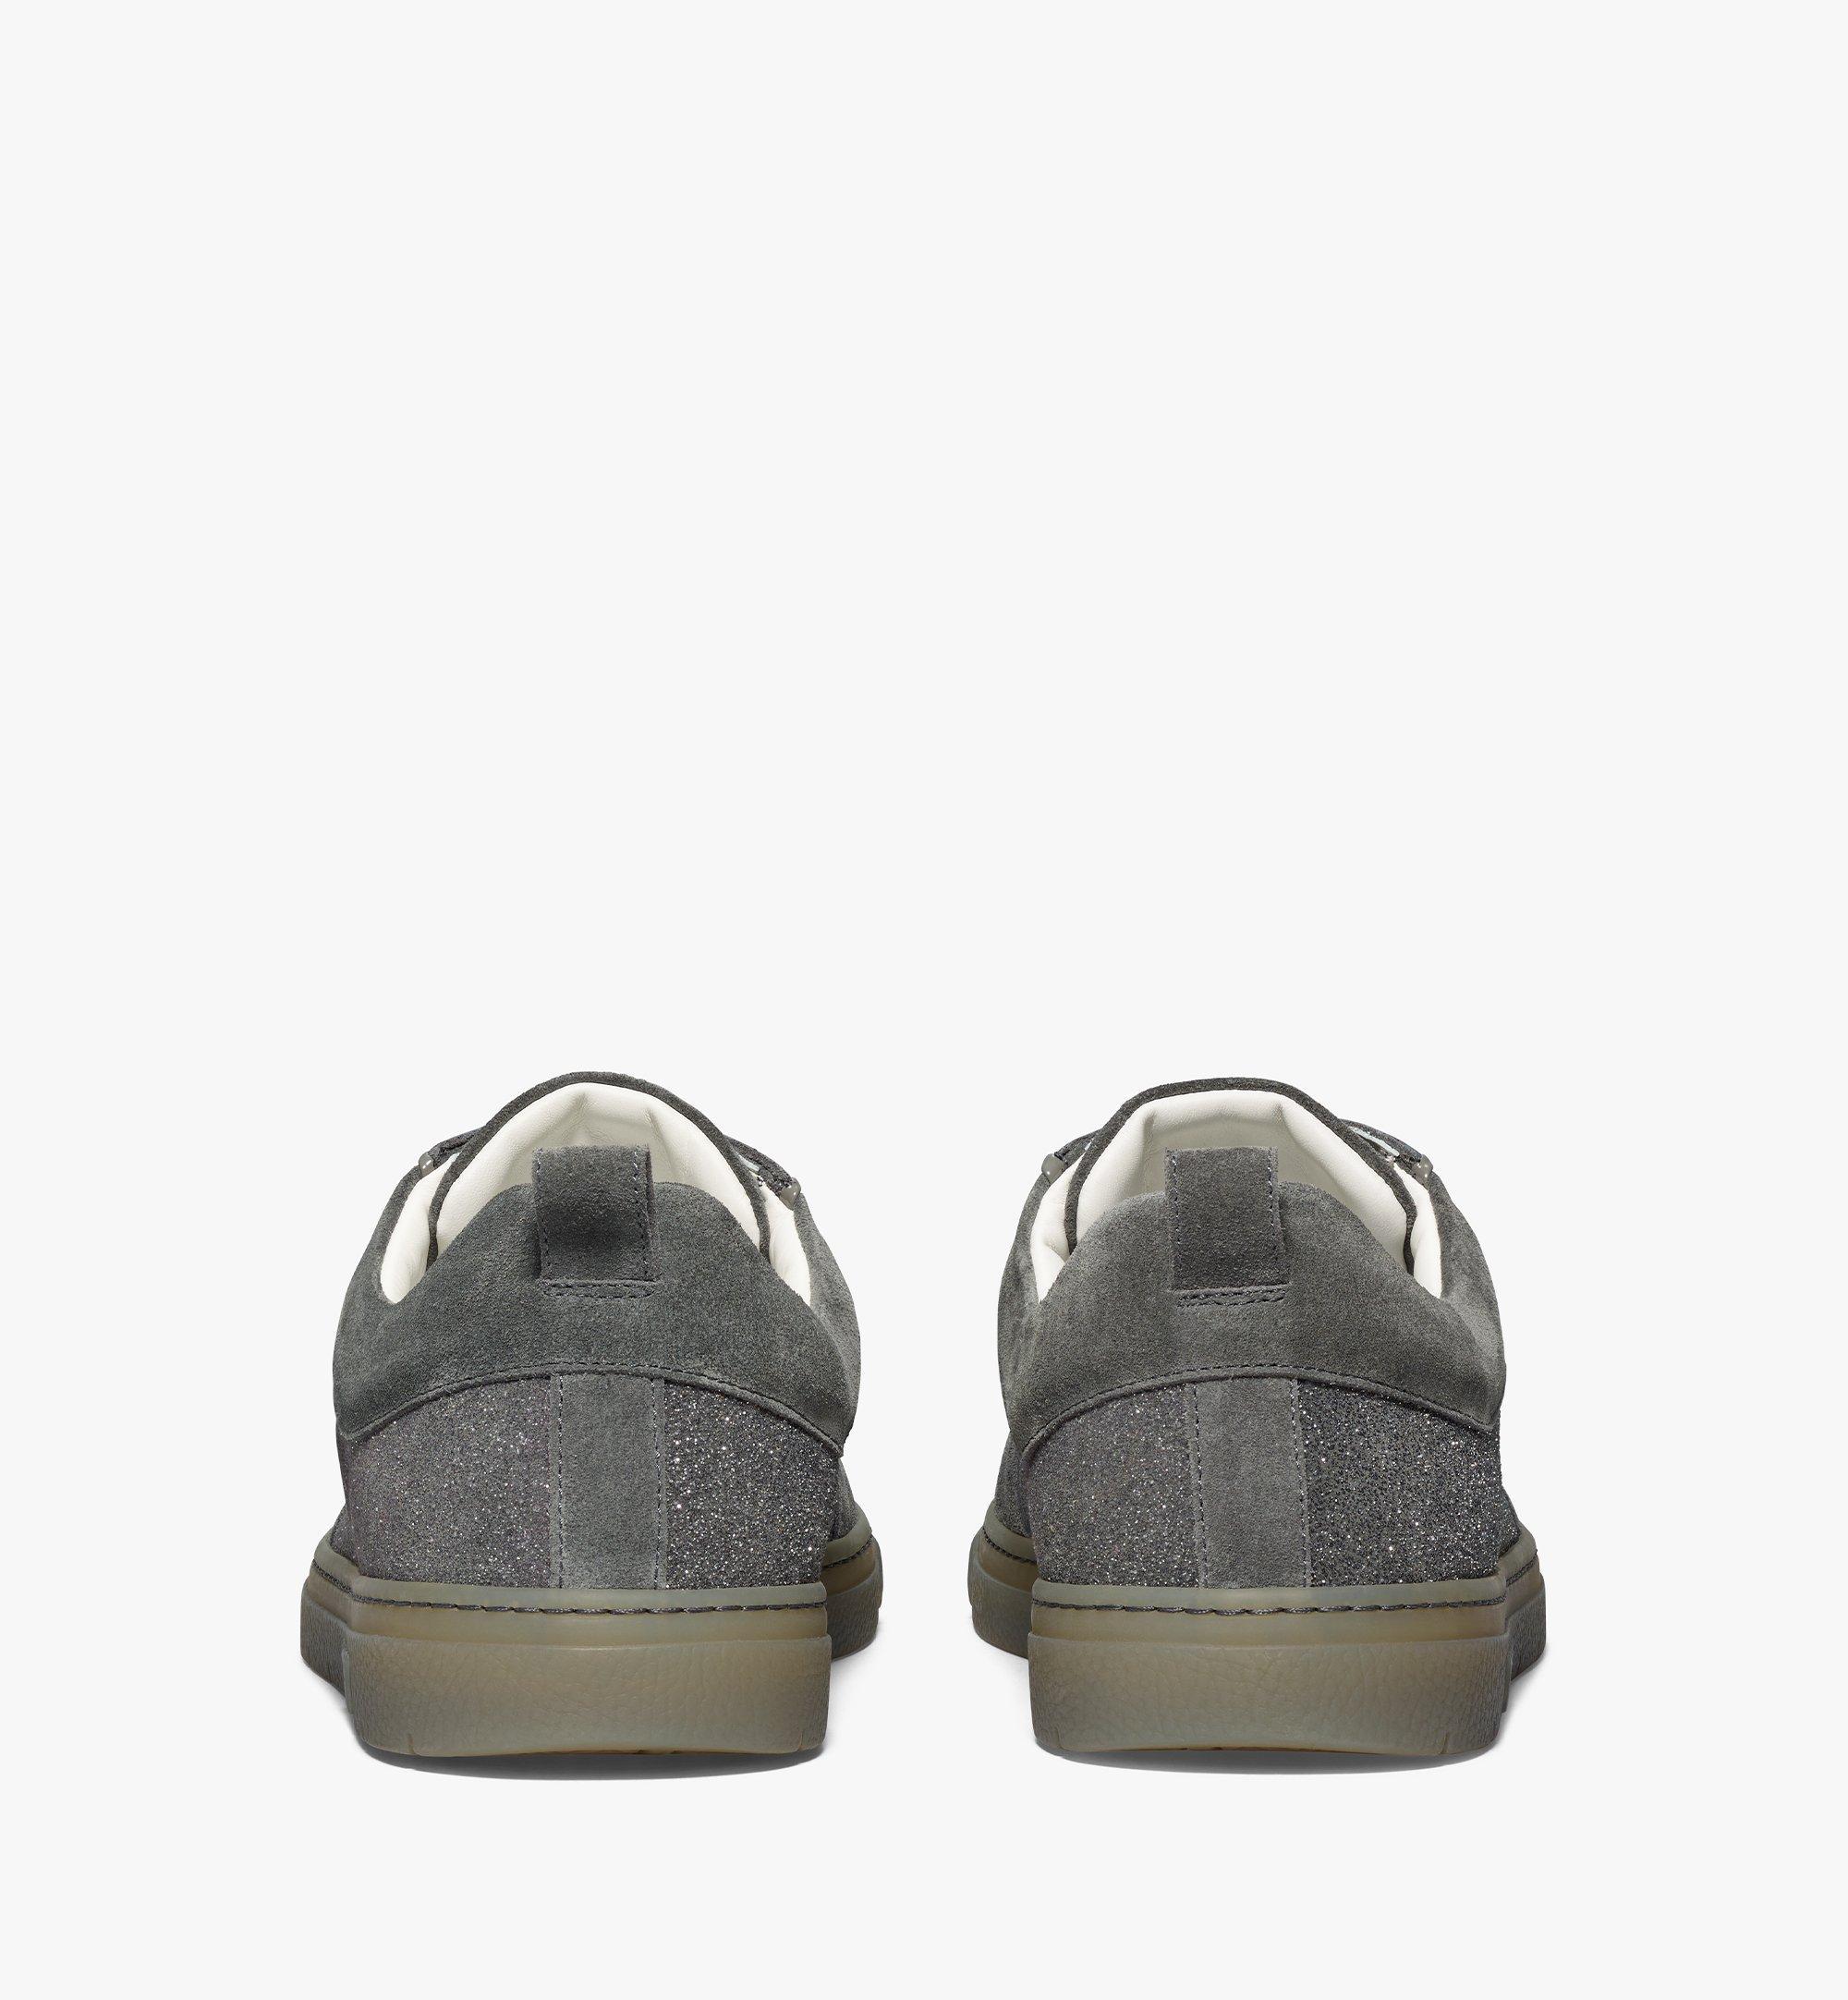 MCM Men's Terrain Lo Sneakers in Multi-Suede Leather Grey MEXBSMM06EO042 Alternate View 2